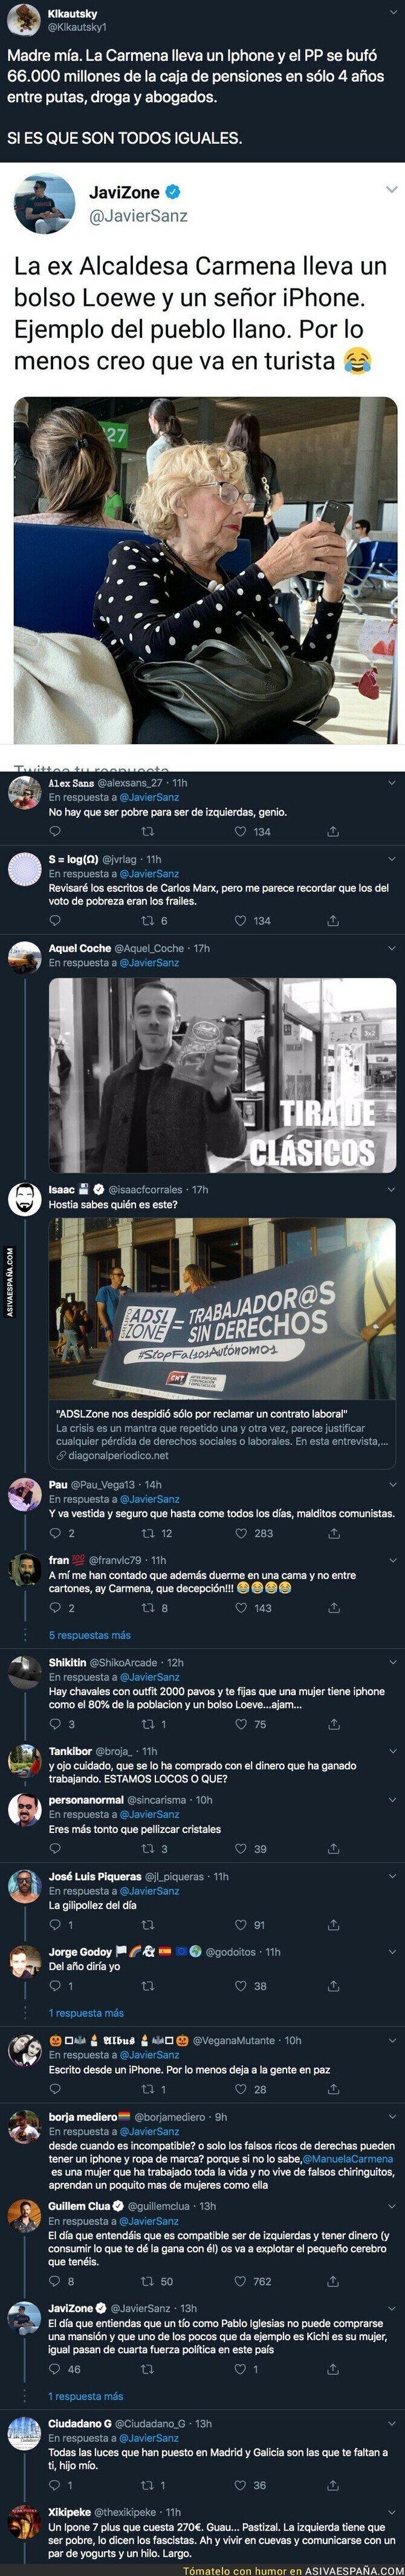 128296 - Javier Sanz, fundador de 'ADSLZone', carga contra Manuela Carmena por tener un iPhone un un bolso caro con este mensaje